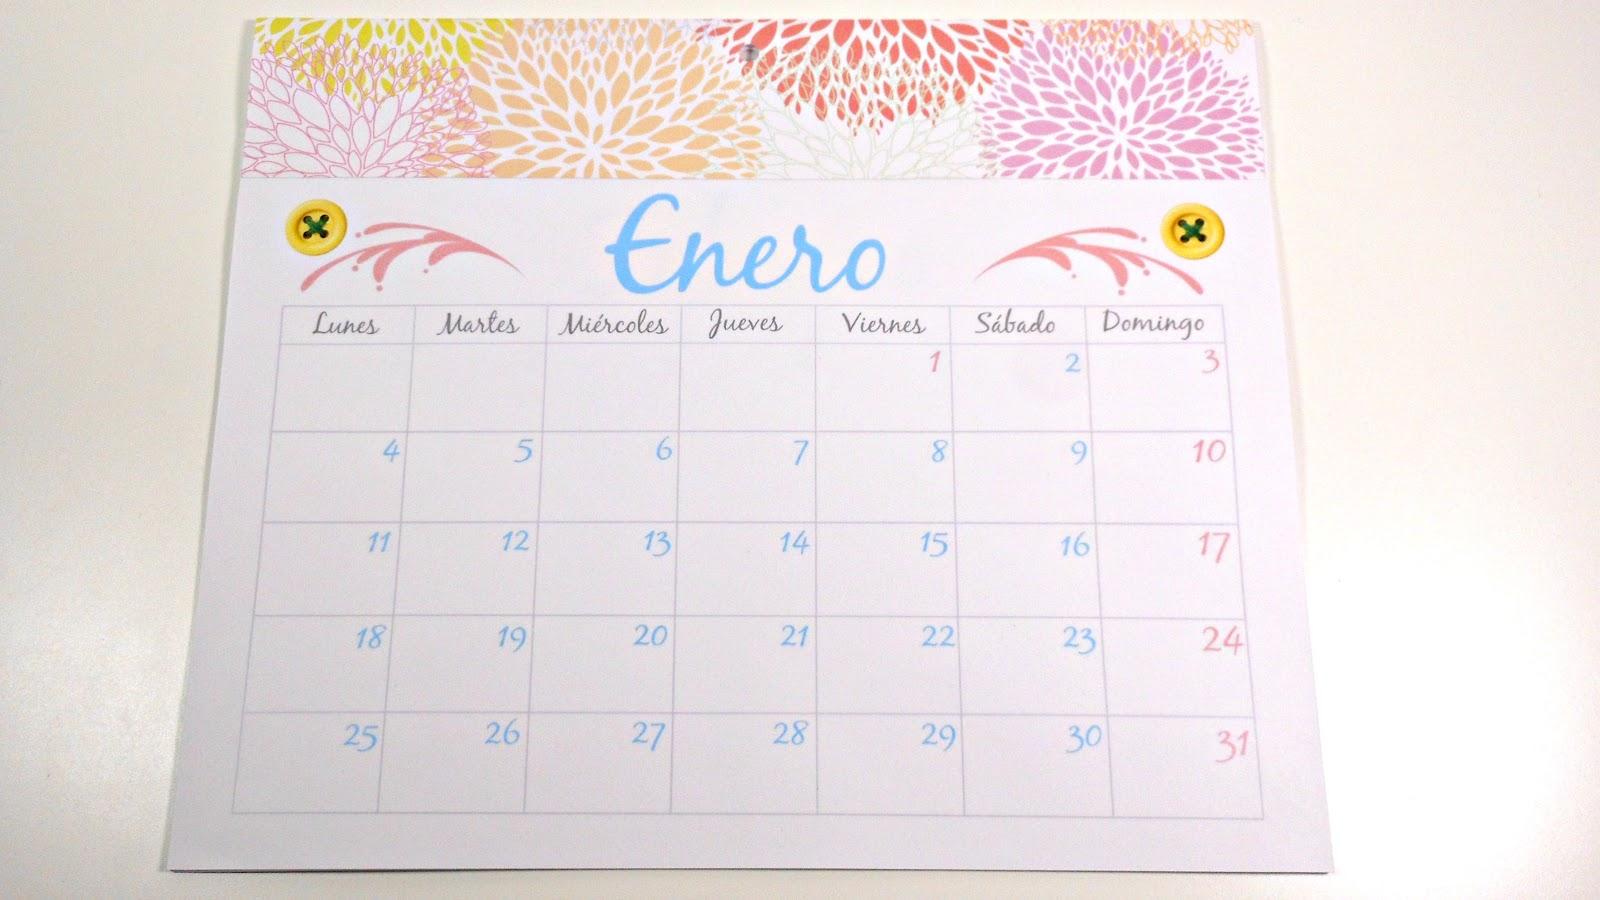 Mundo party c mo hacer tu propio calendario parte 2 - Como hacer tu propio calendario ...